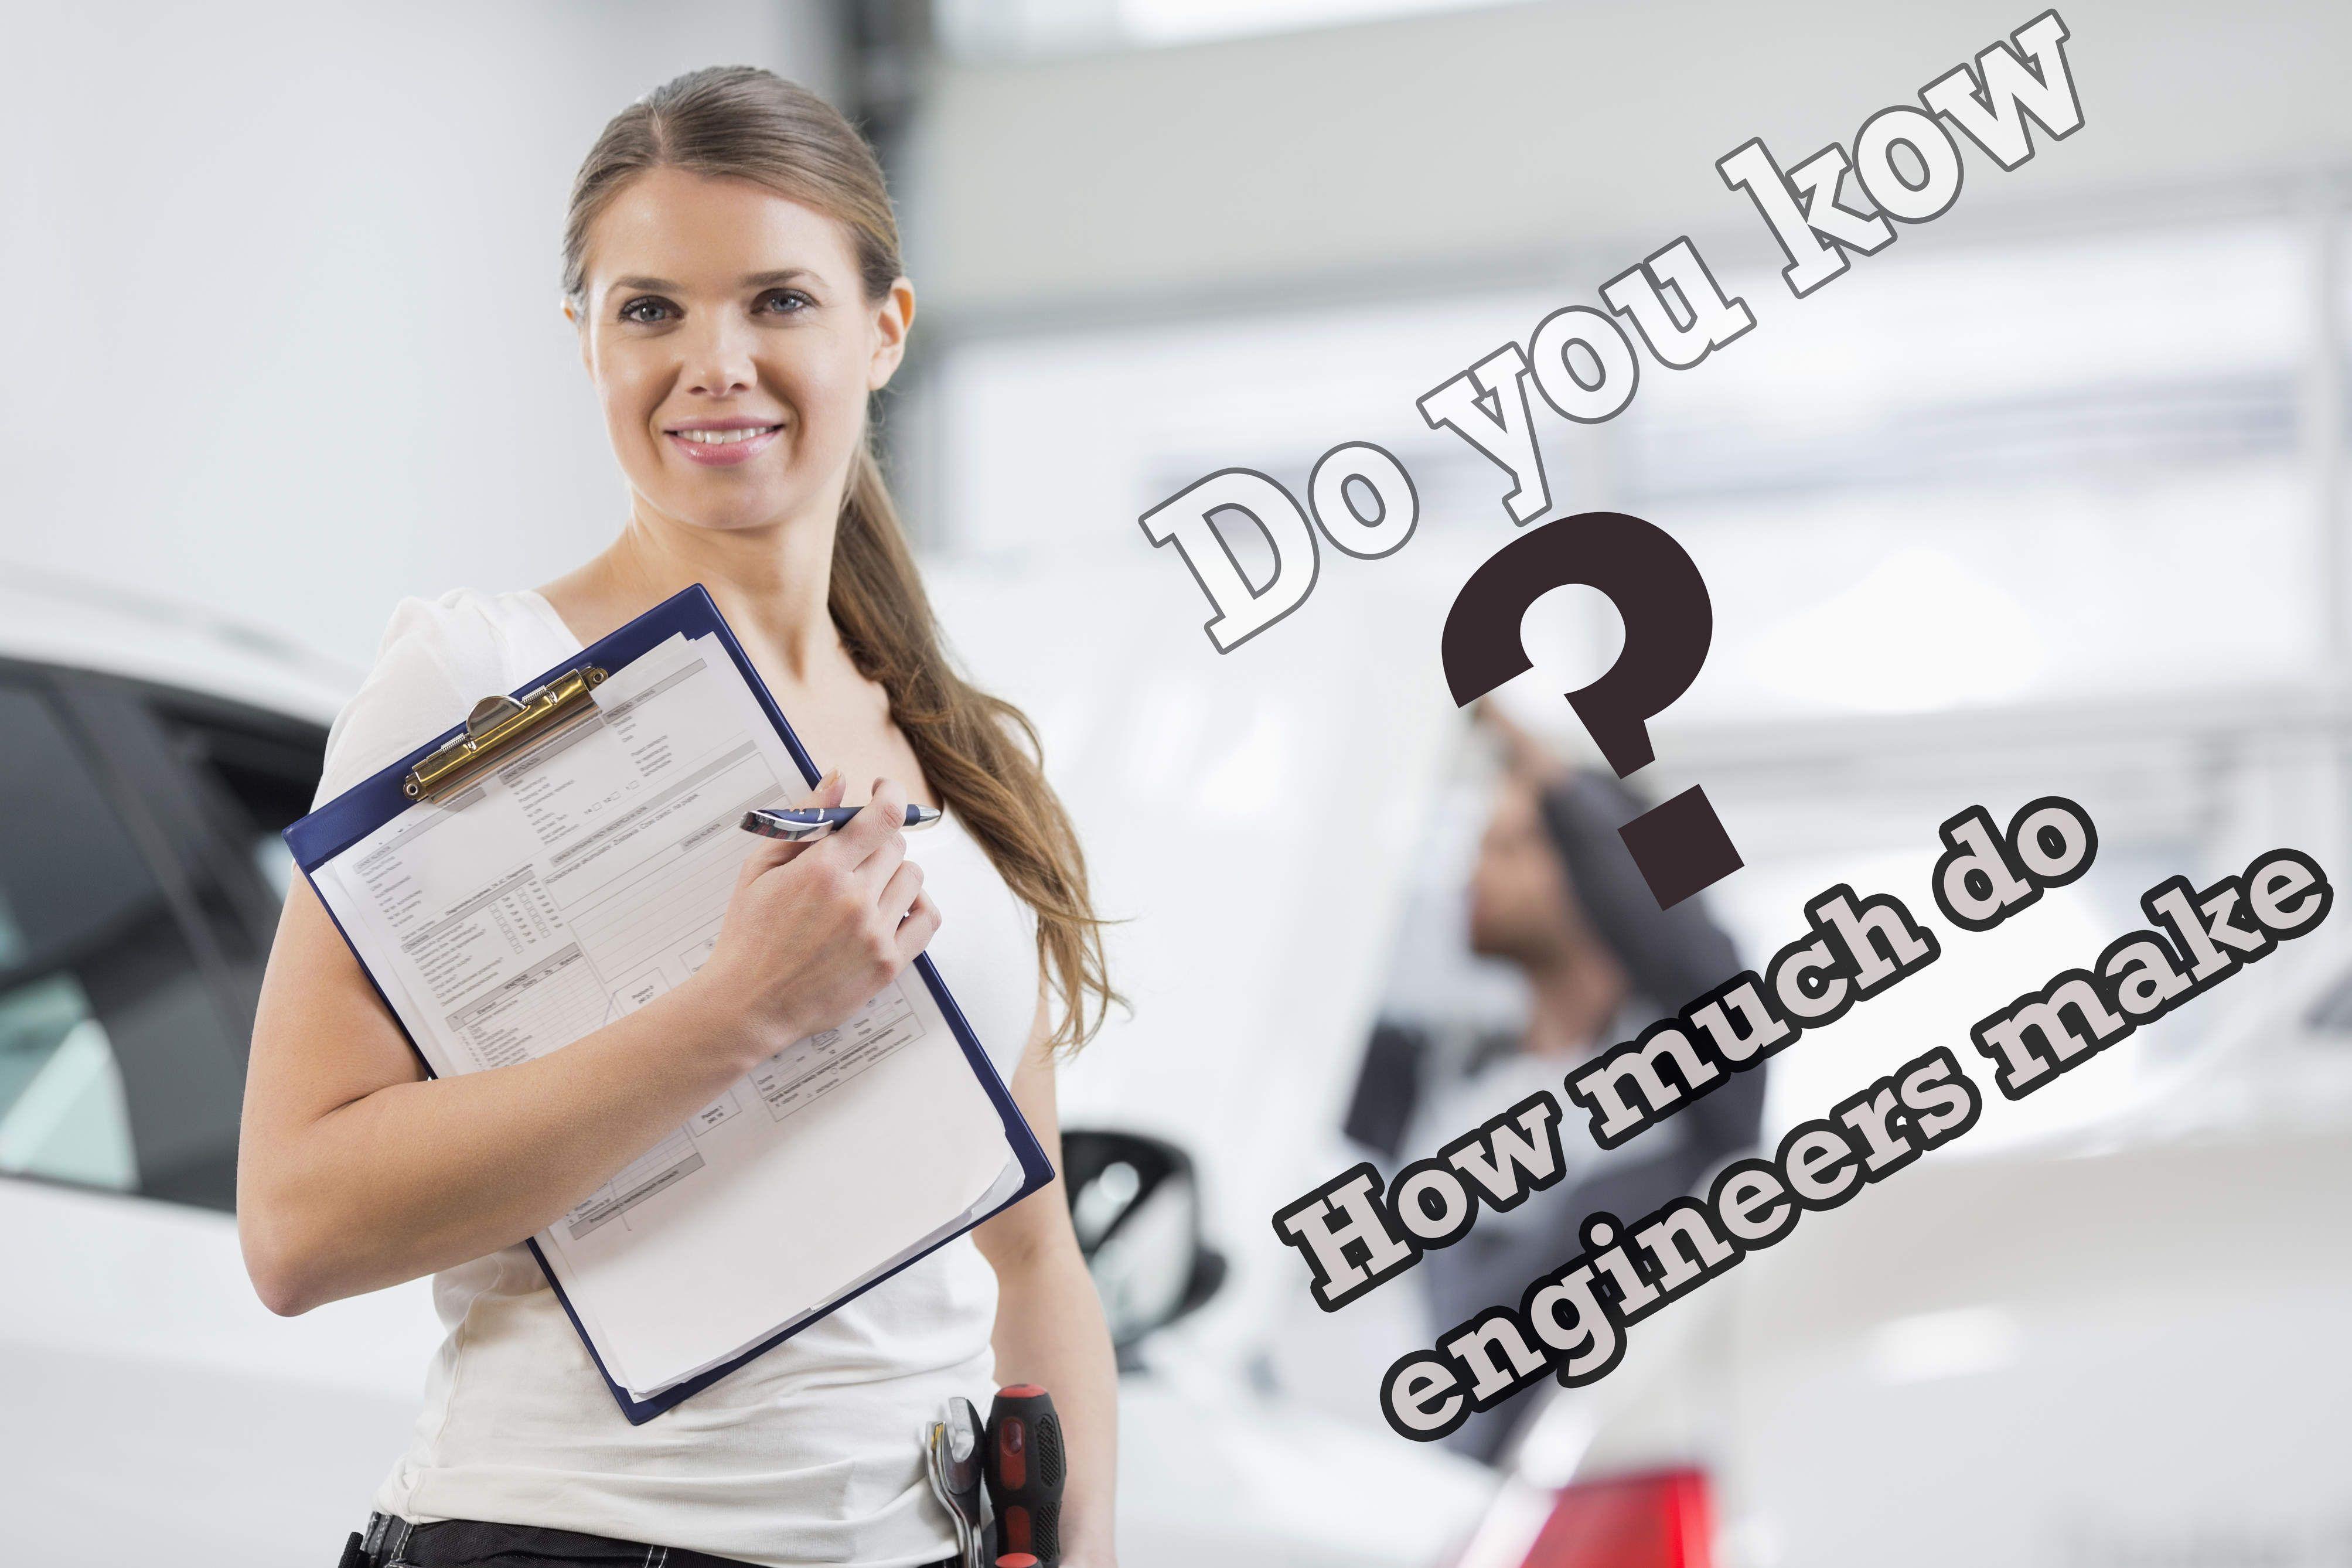 Computer Hardware Engineer Job Description  What Do Computer